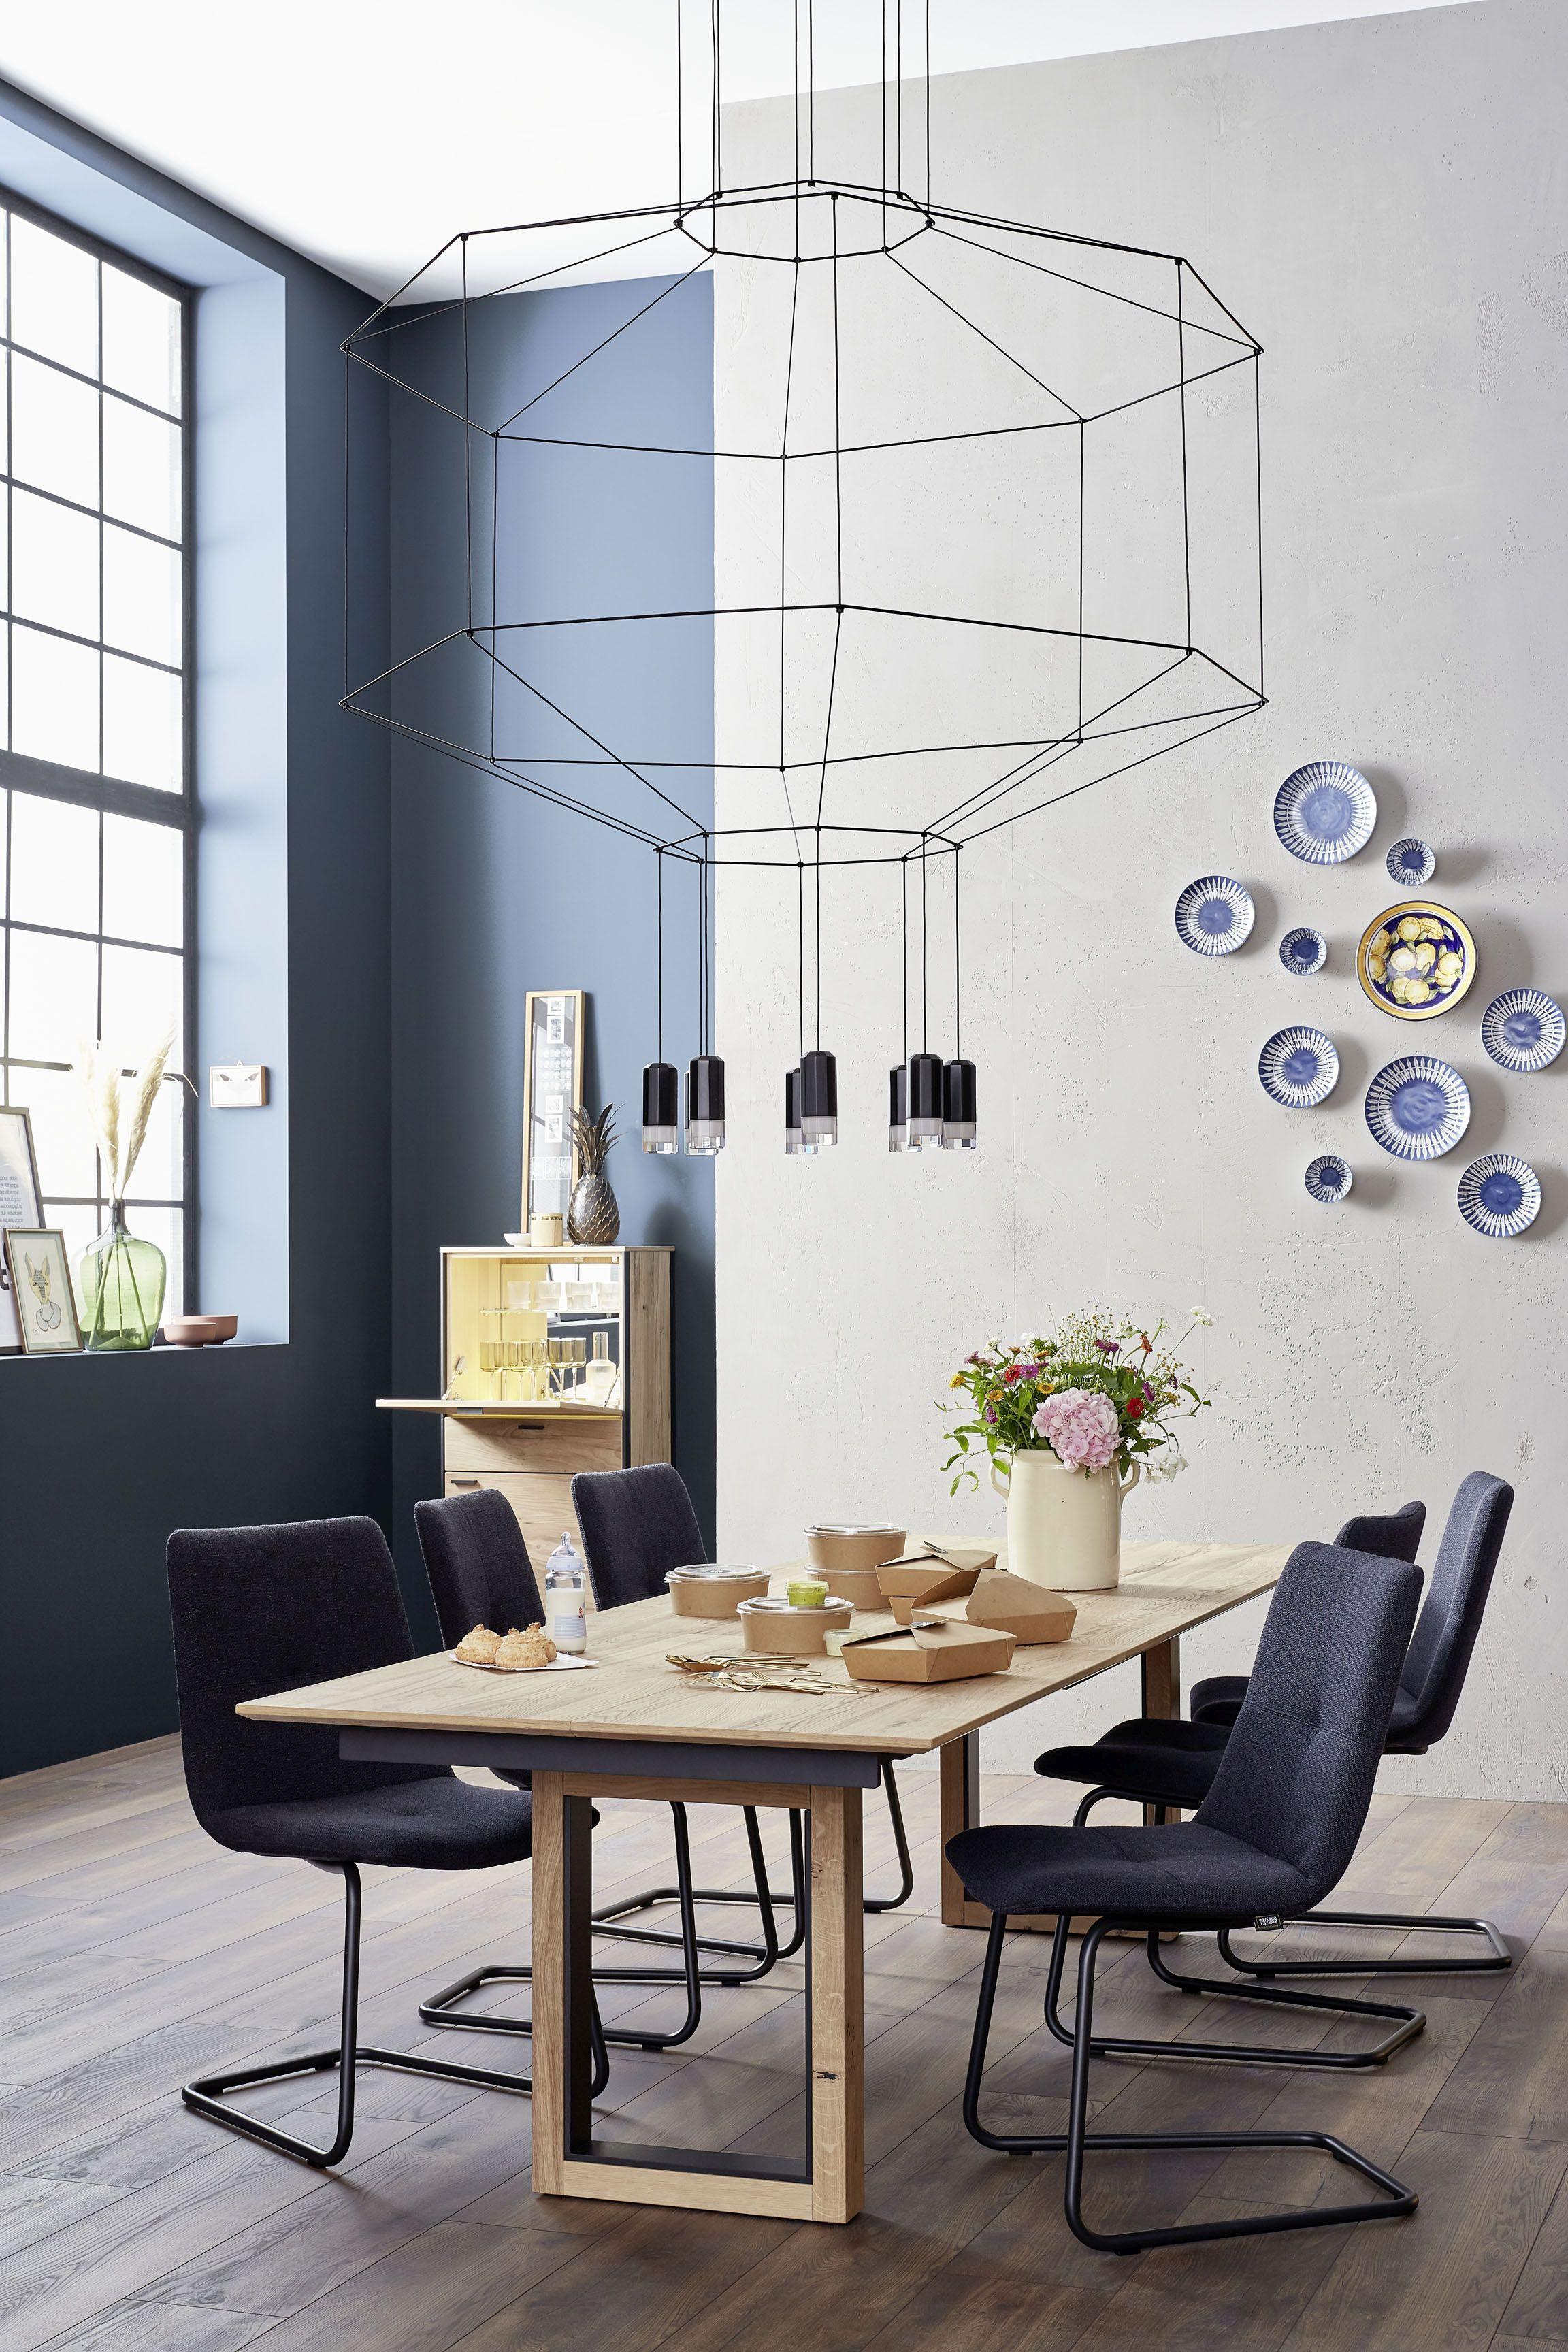 Swing In 2020 Esstisch Haus Deko Schoner Wohnen